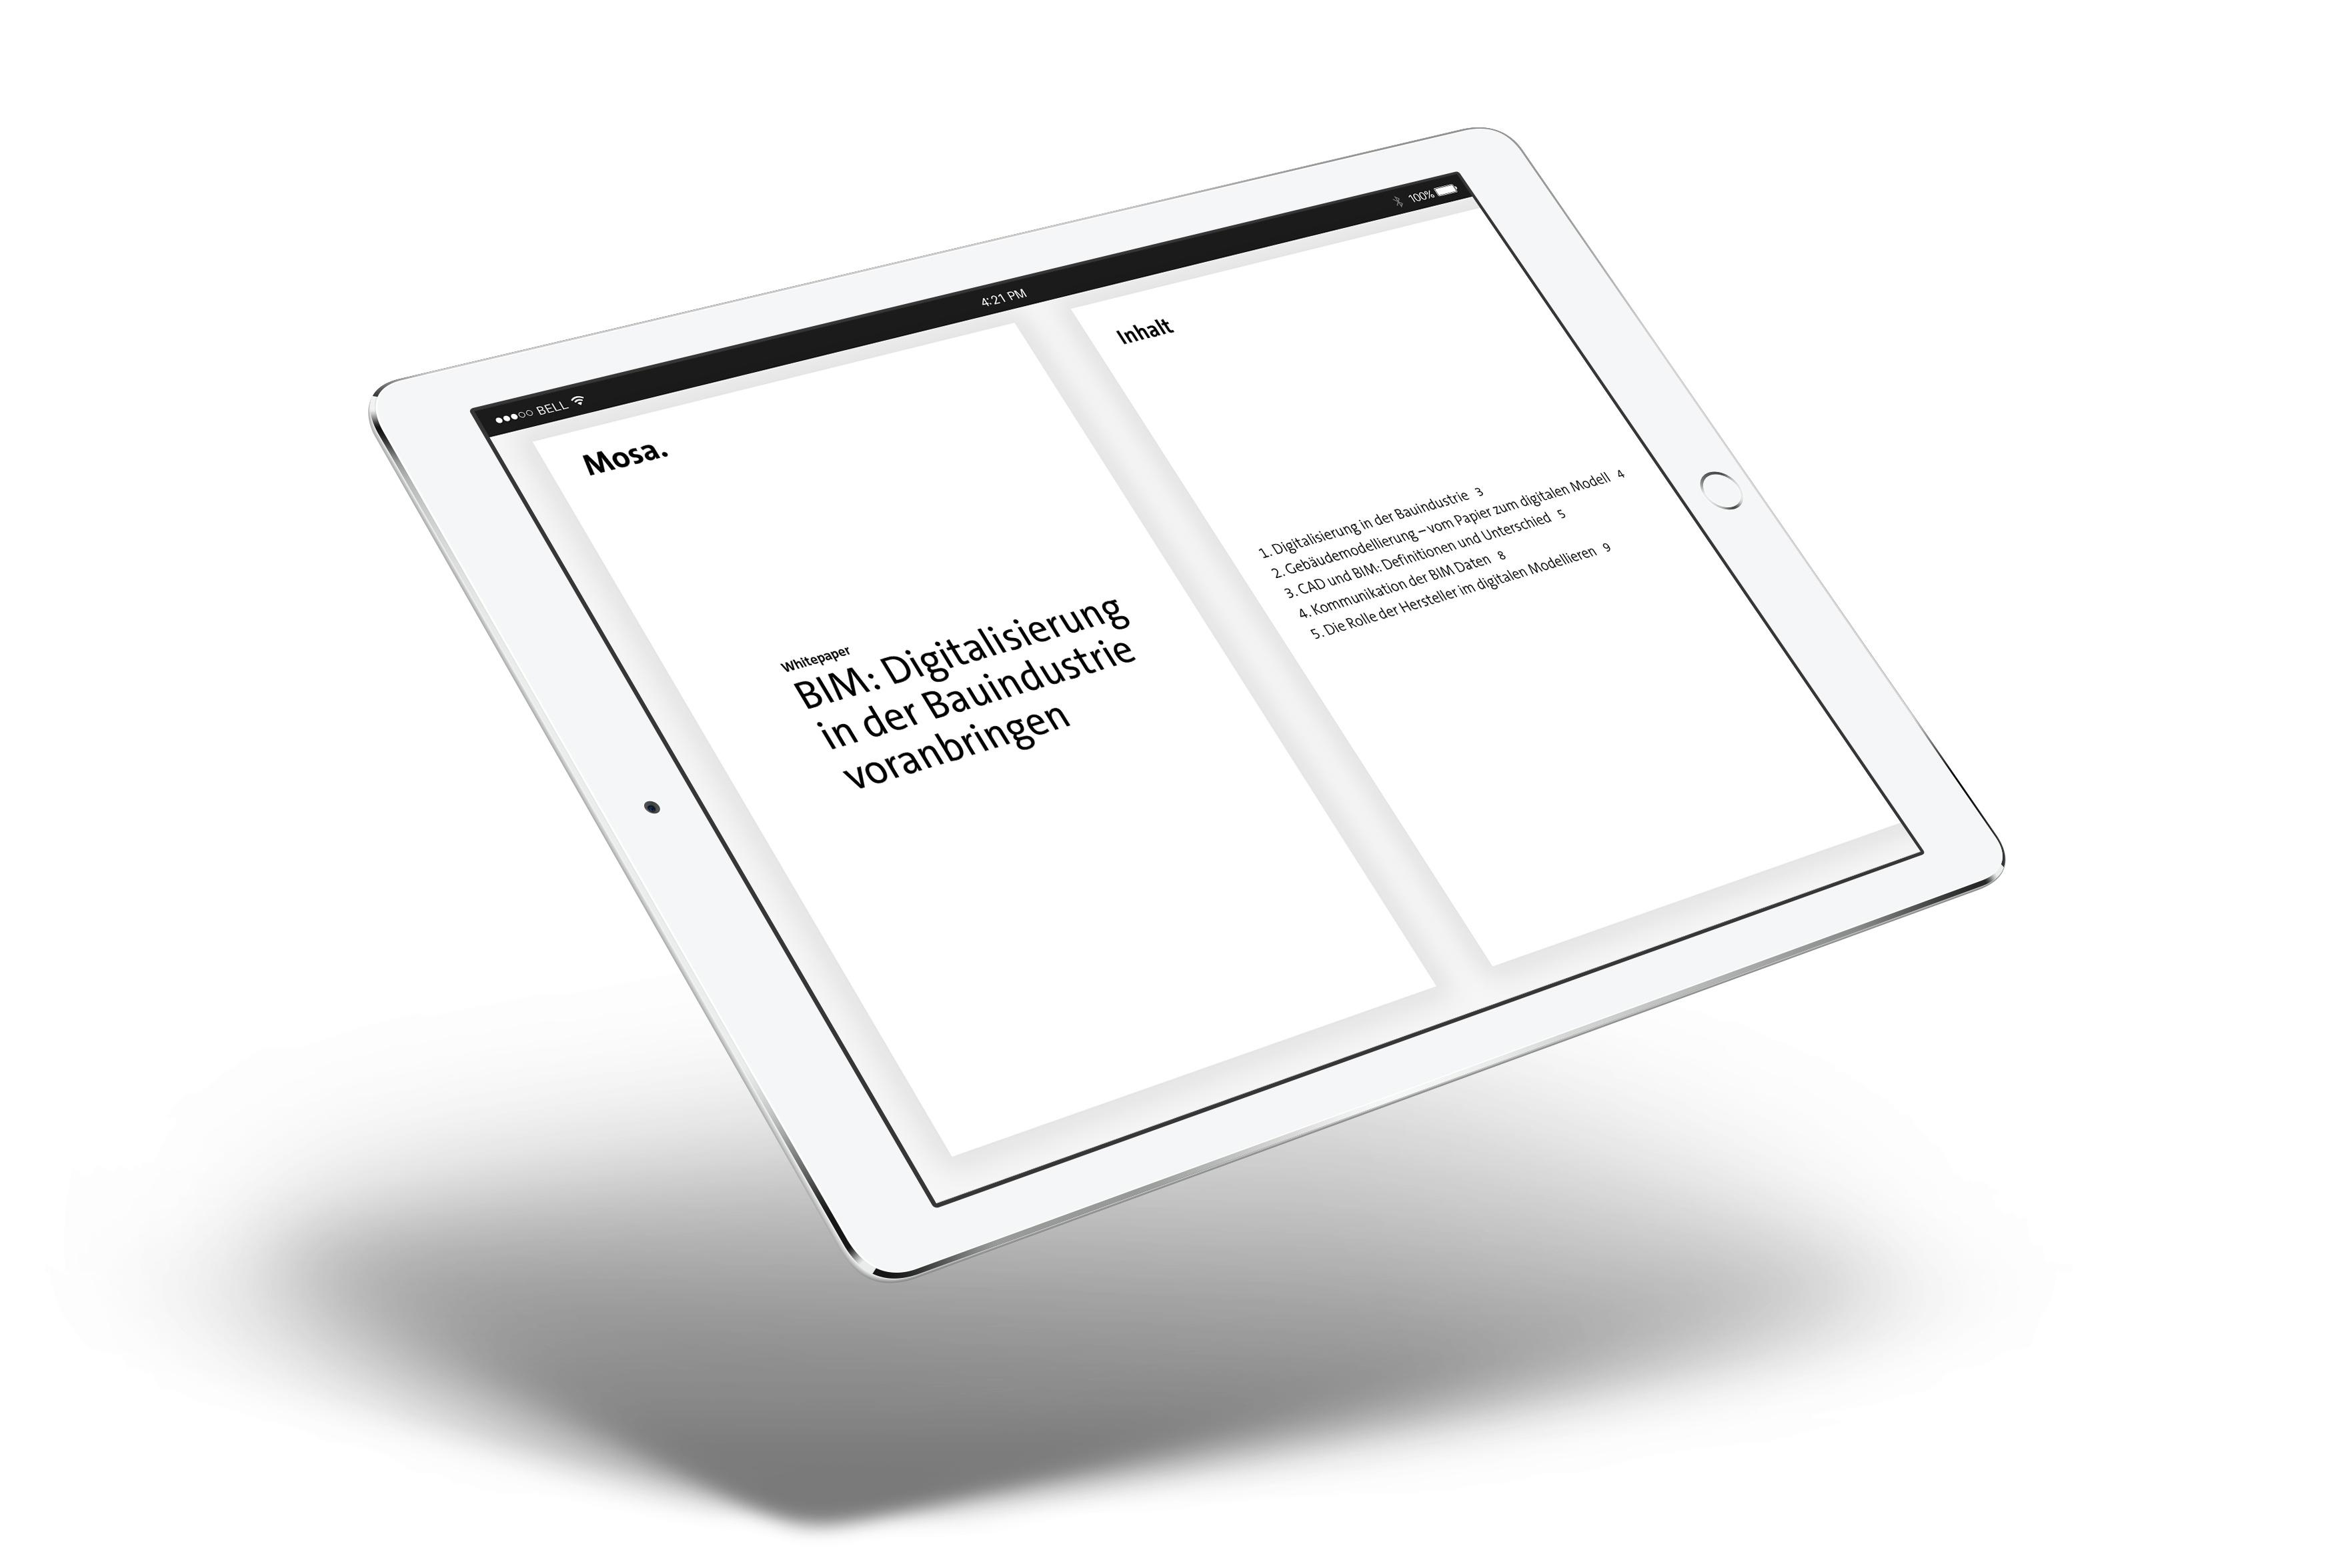 DE-WHITEPAPER-iPad-Landscape.jpg